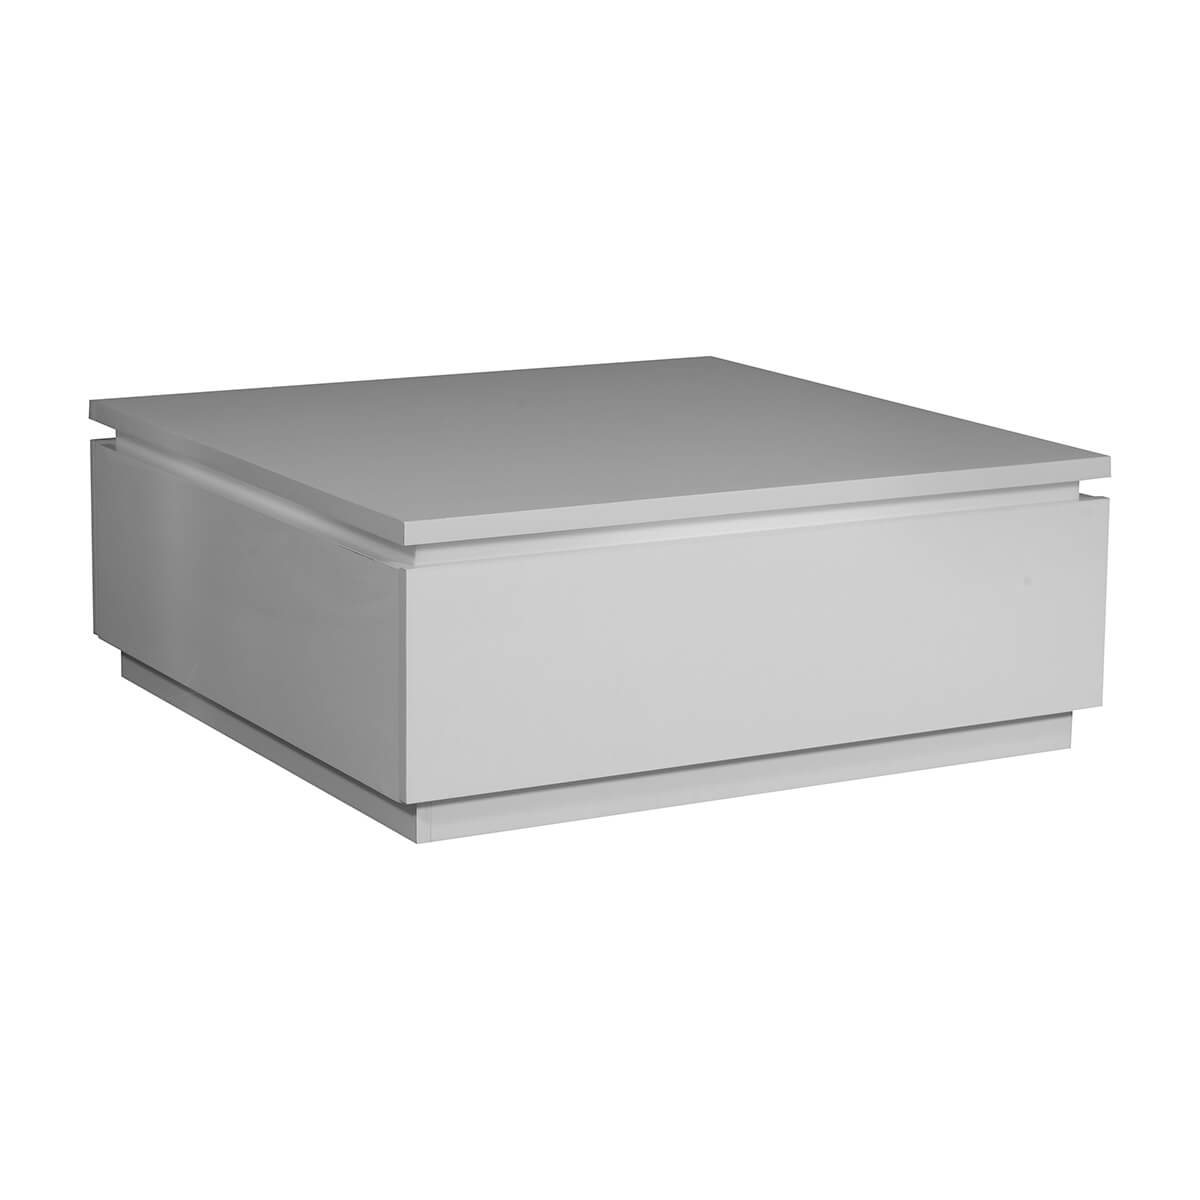 logan coffee table white high gloss with lights storage